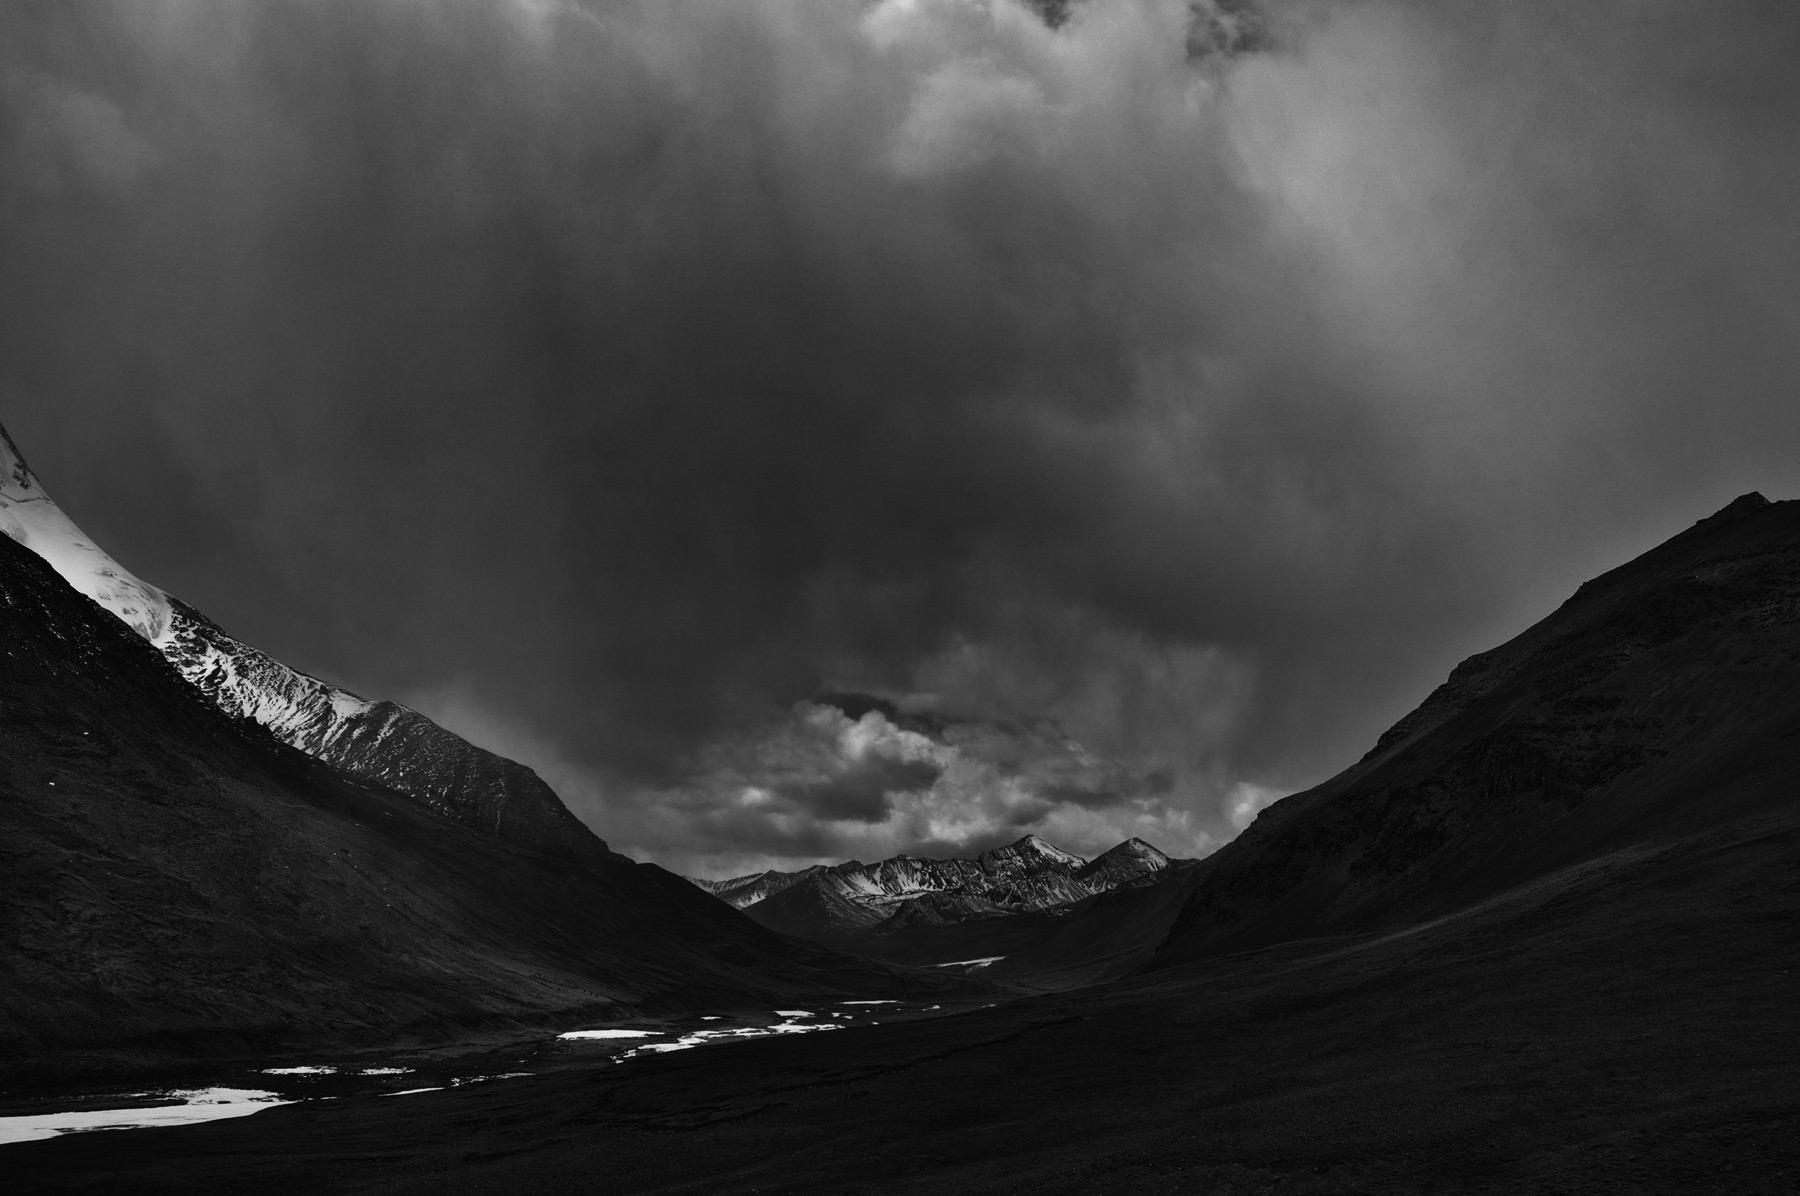 mountain-view-glacier-tibet.jpg